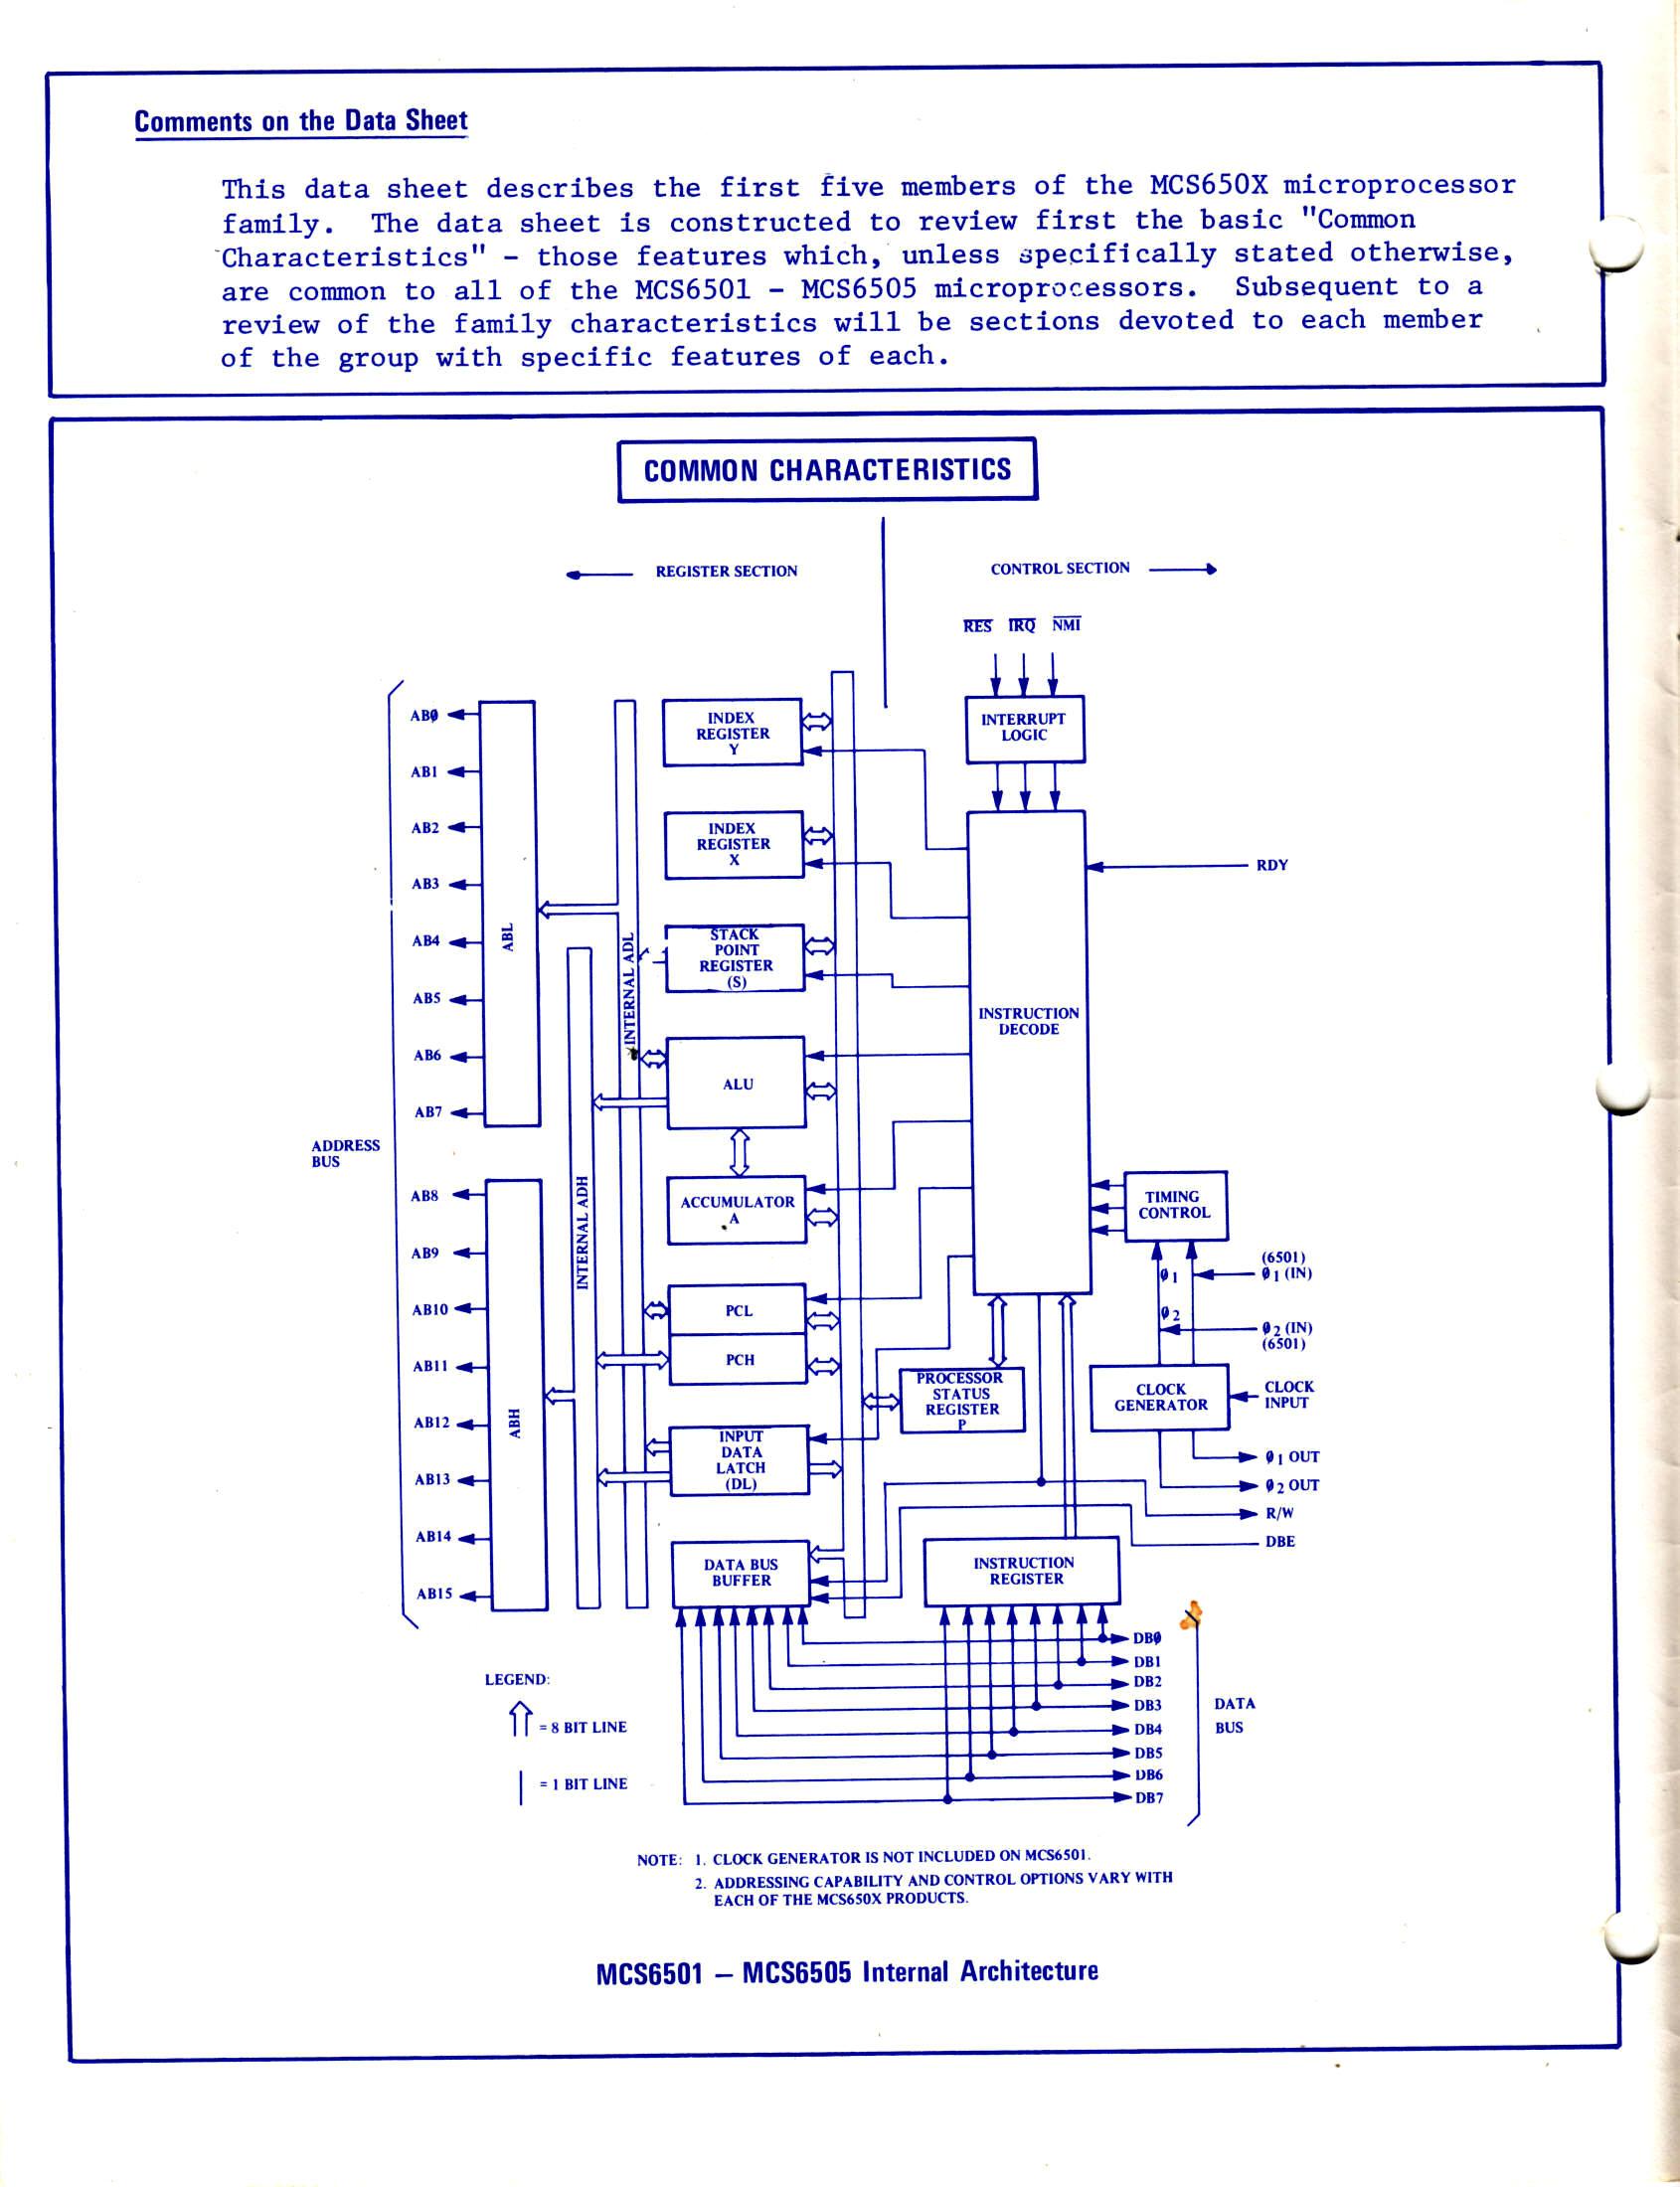 6501-6505 and 6530 Data Sheets